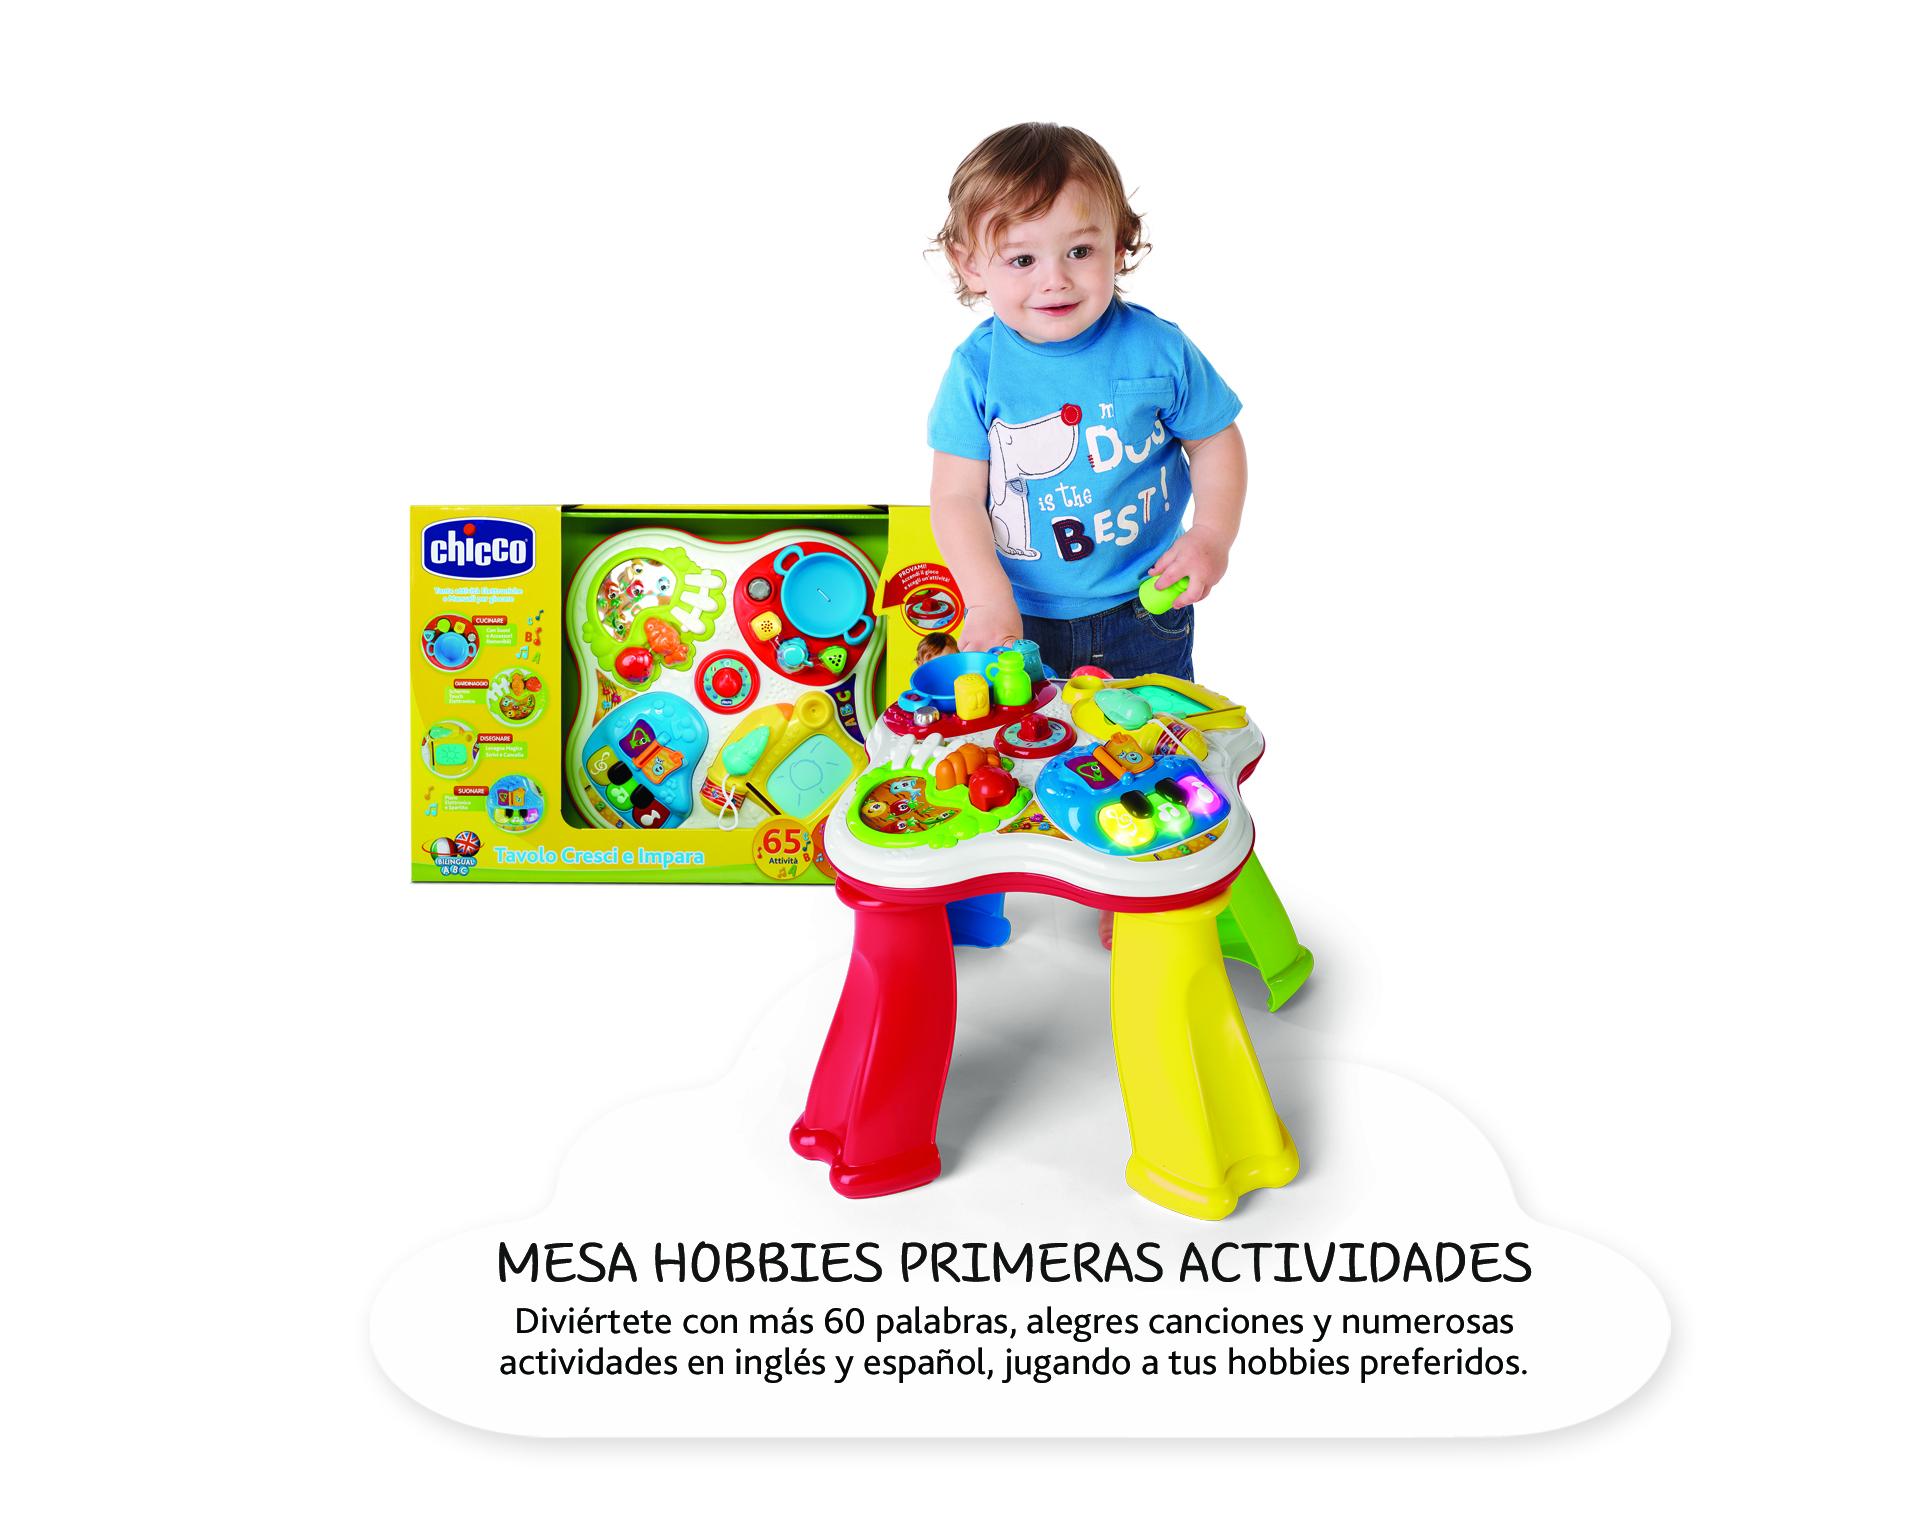 MESA HOBBIES PRIMERAS ACTIVIDADES 76530 - N84218